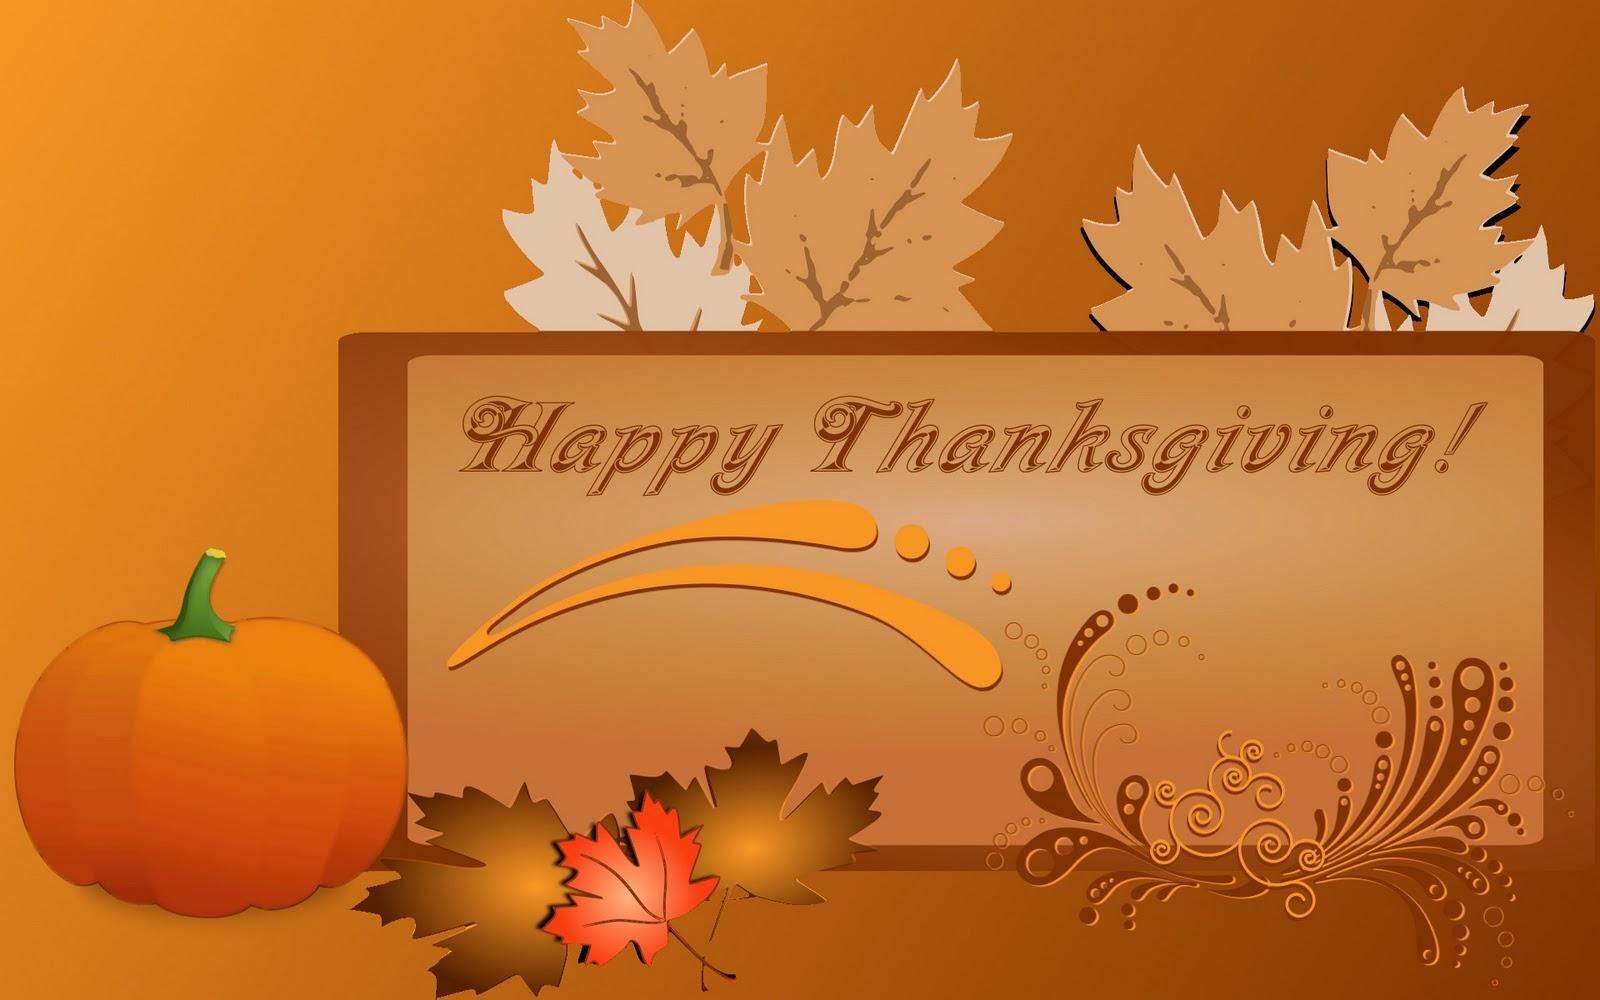 Happy Thanksgiving Pics - High Resolution Thanksgiving Background - HD Wallpaper